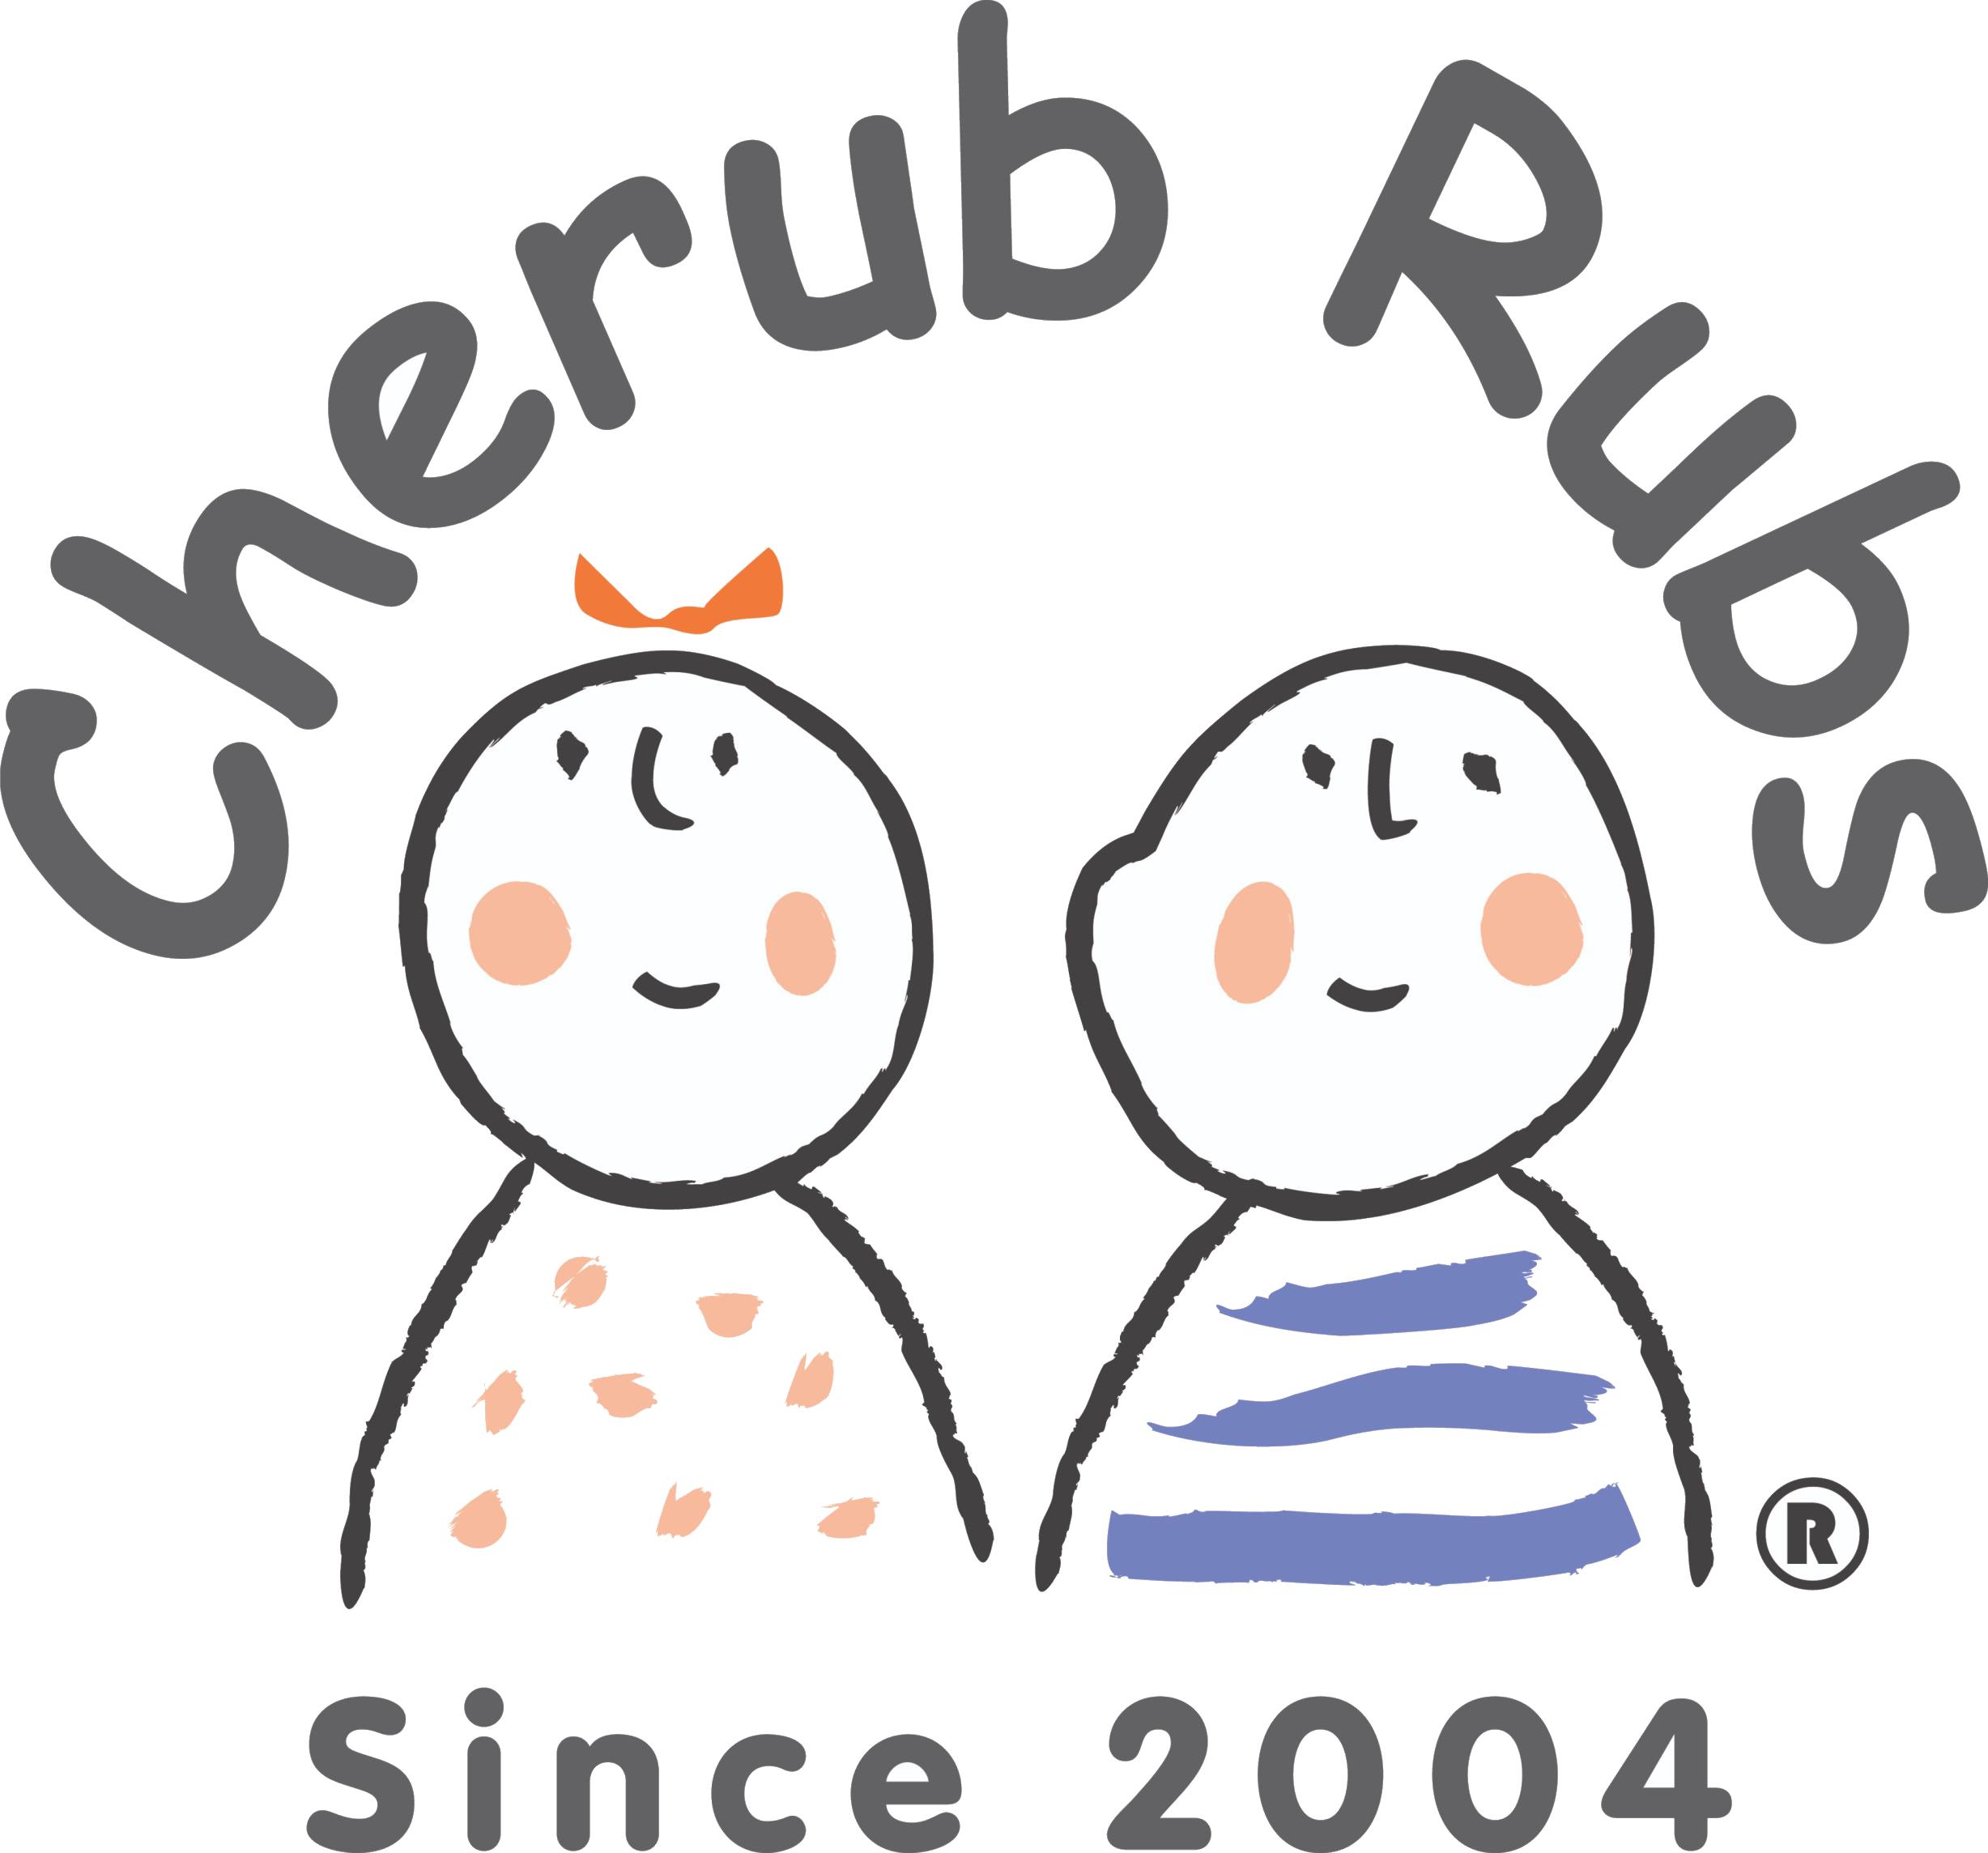 cherub-rubs-logo.png